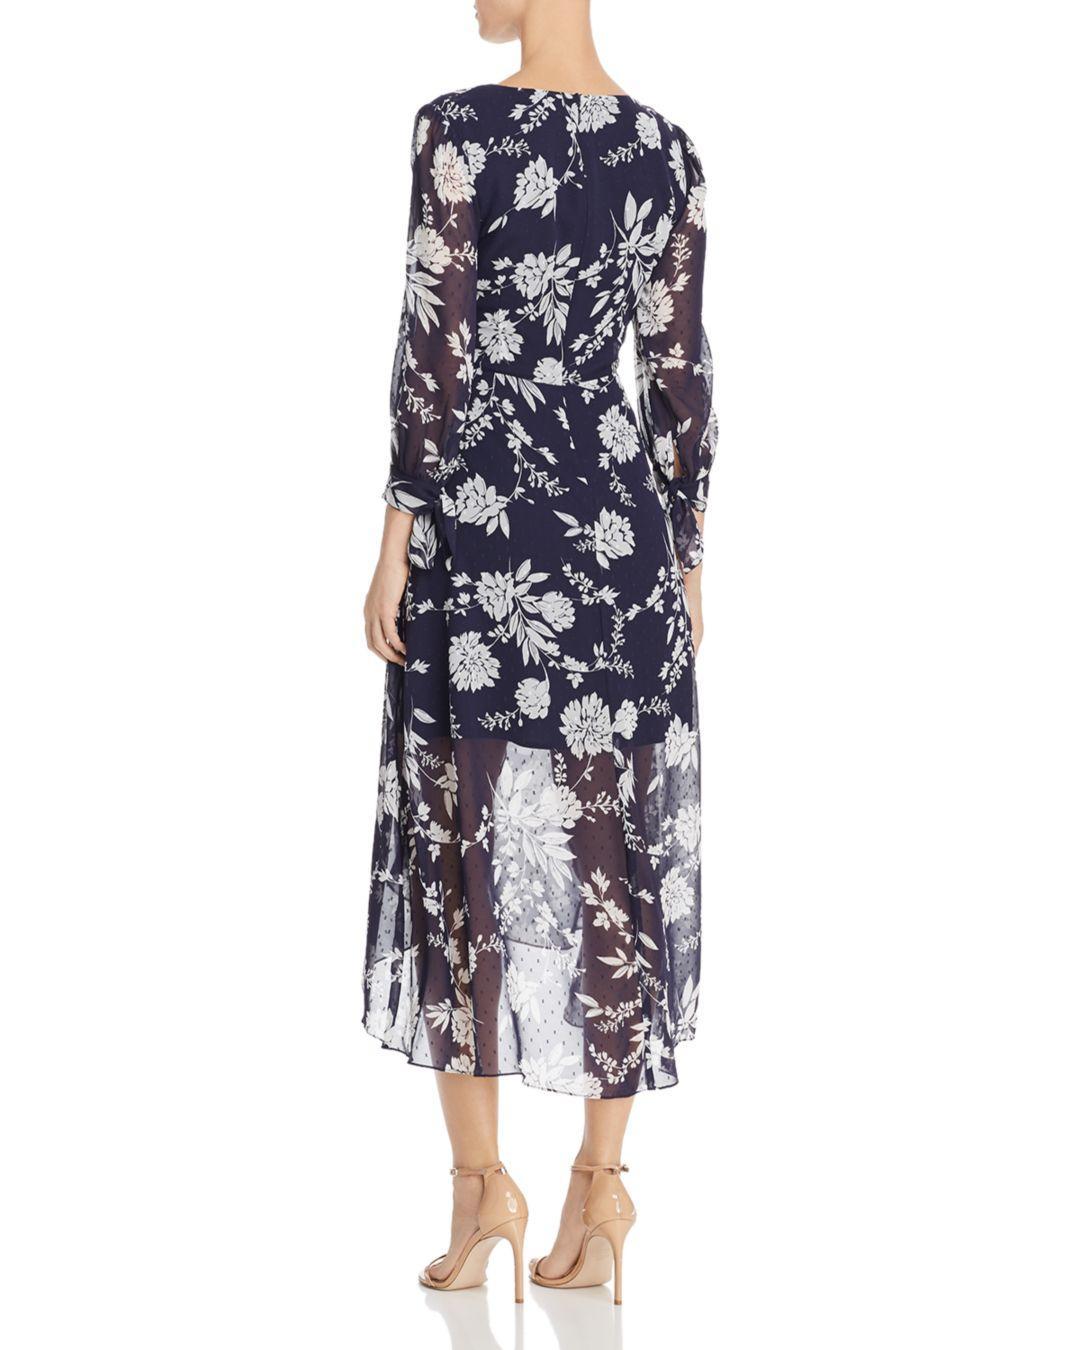 c3afb1a7c36c Lyst - Eliza J Floral Faux-wrap Dress in Blue